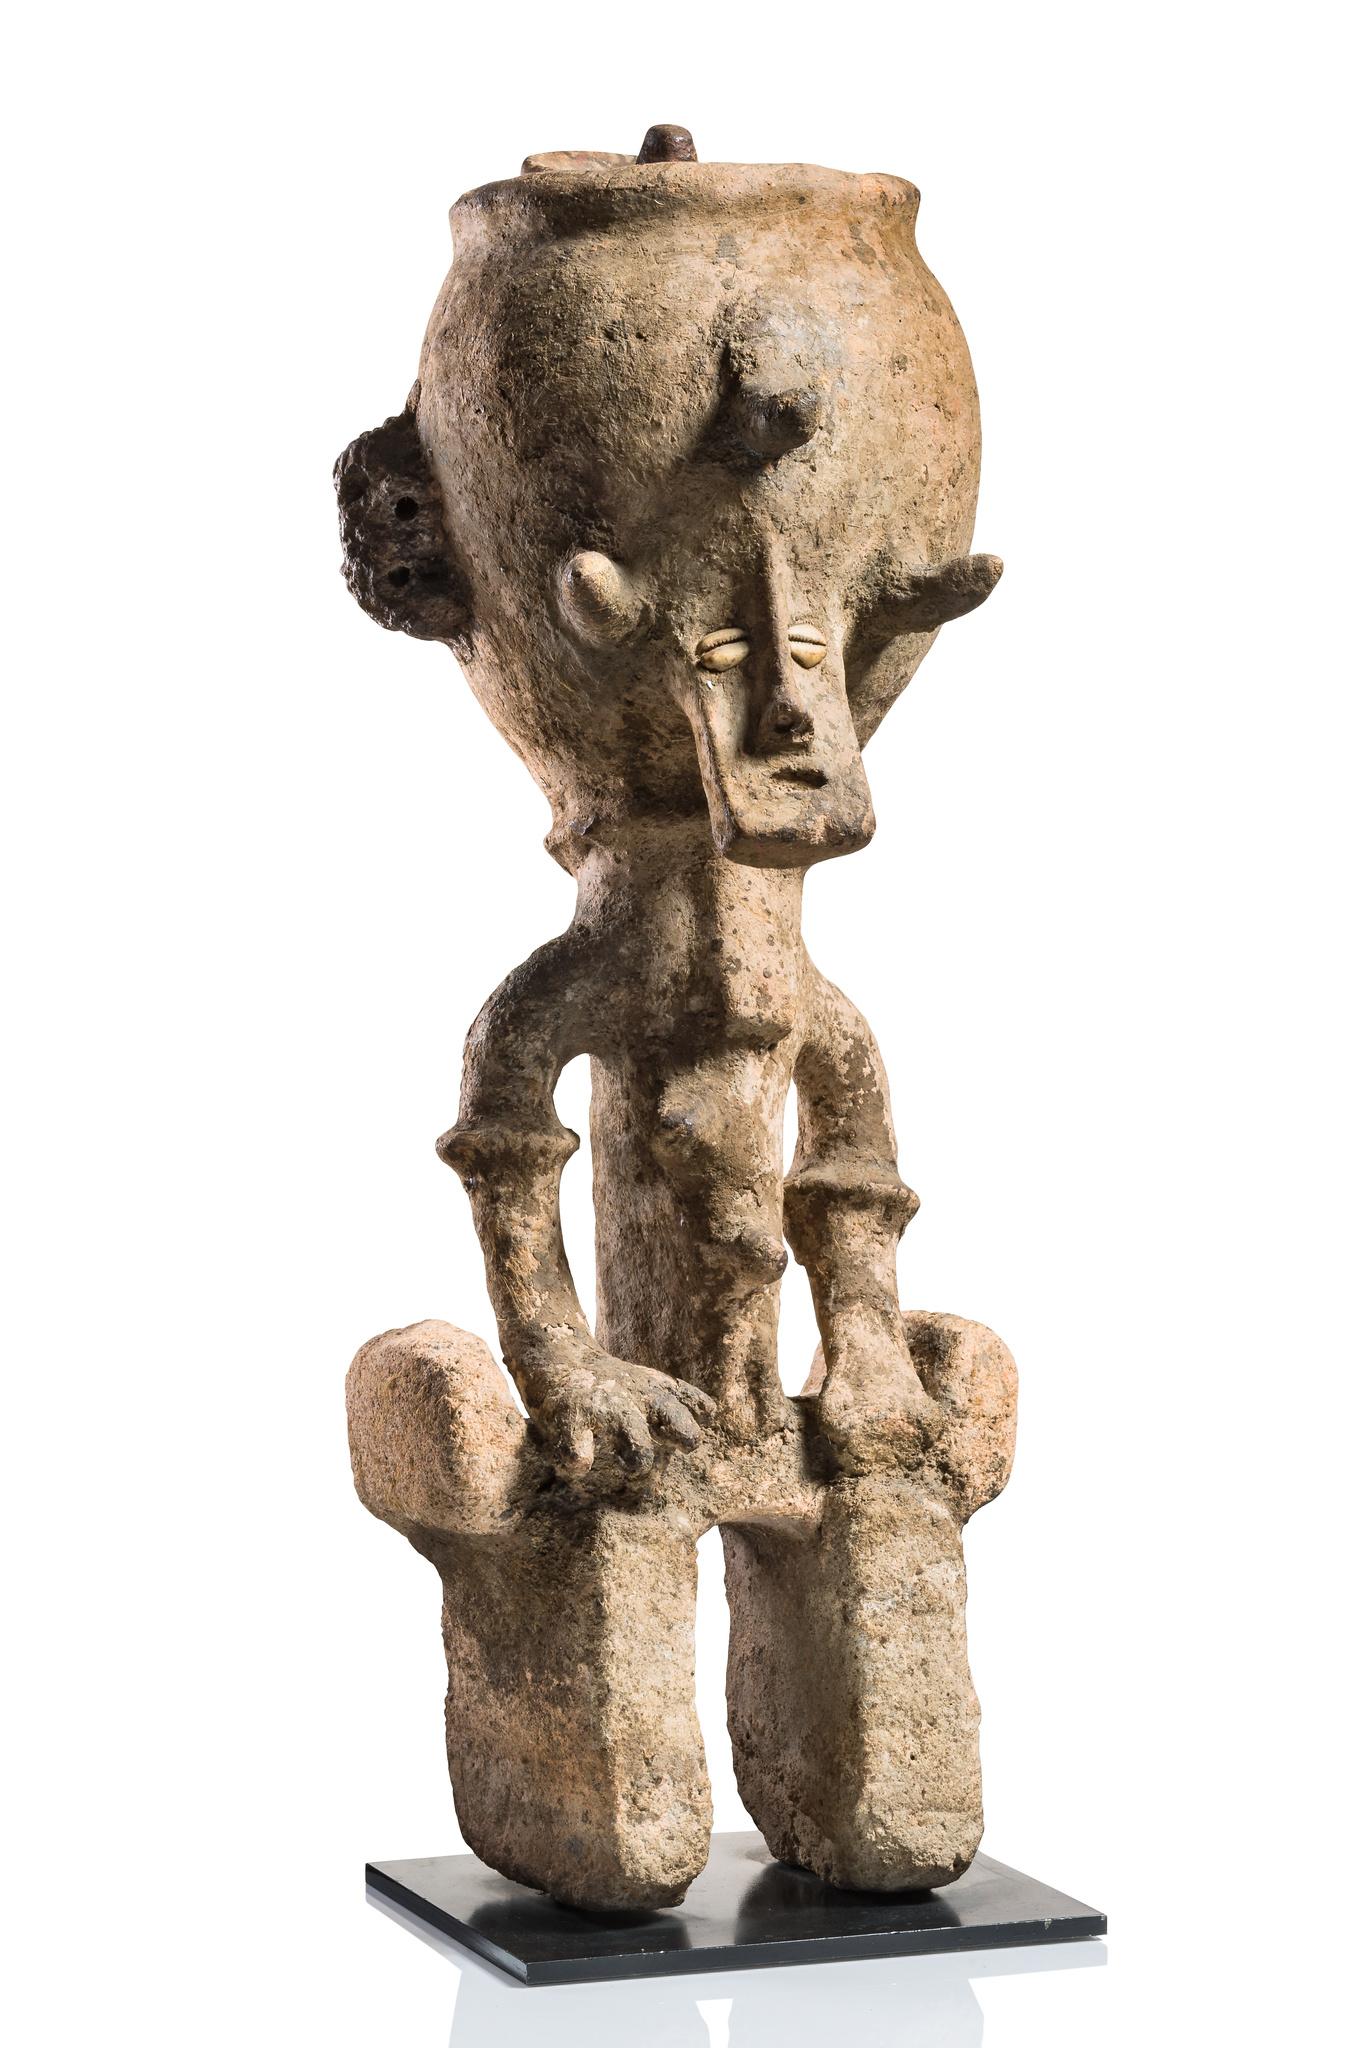 Vey rare anthropomorphic caryatid vessel